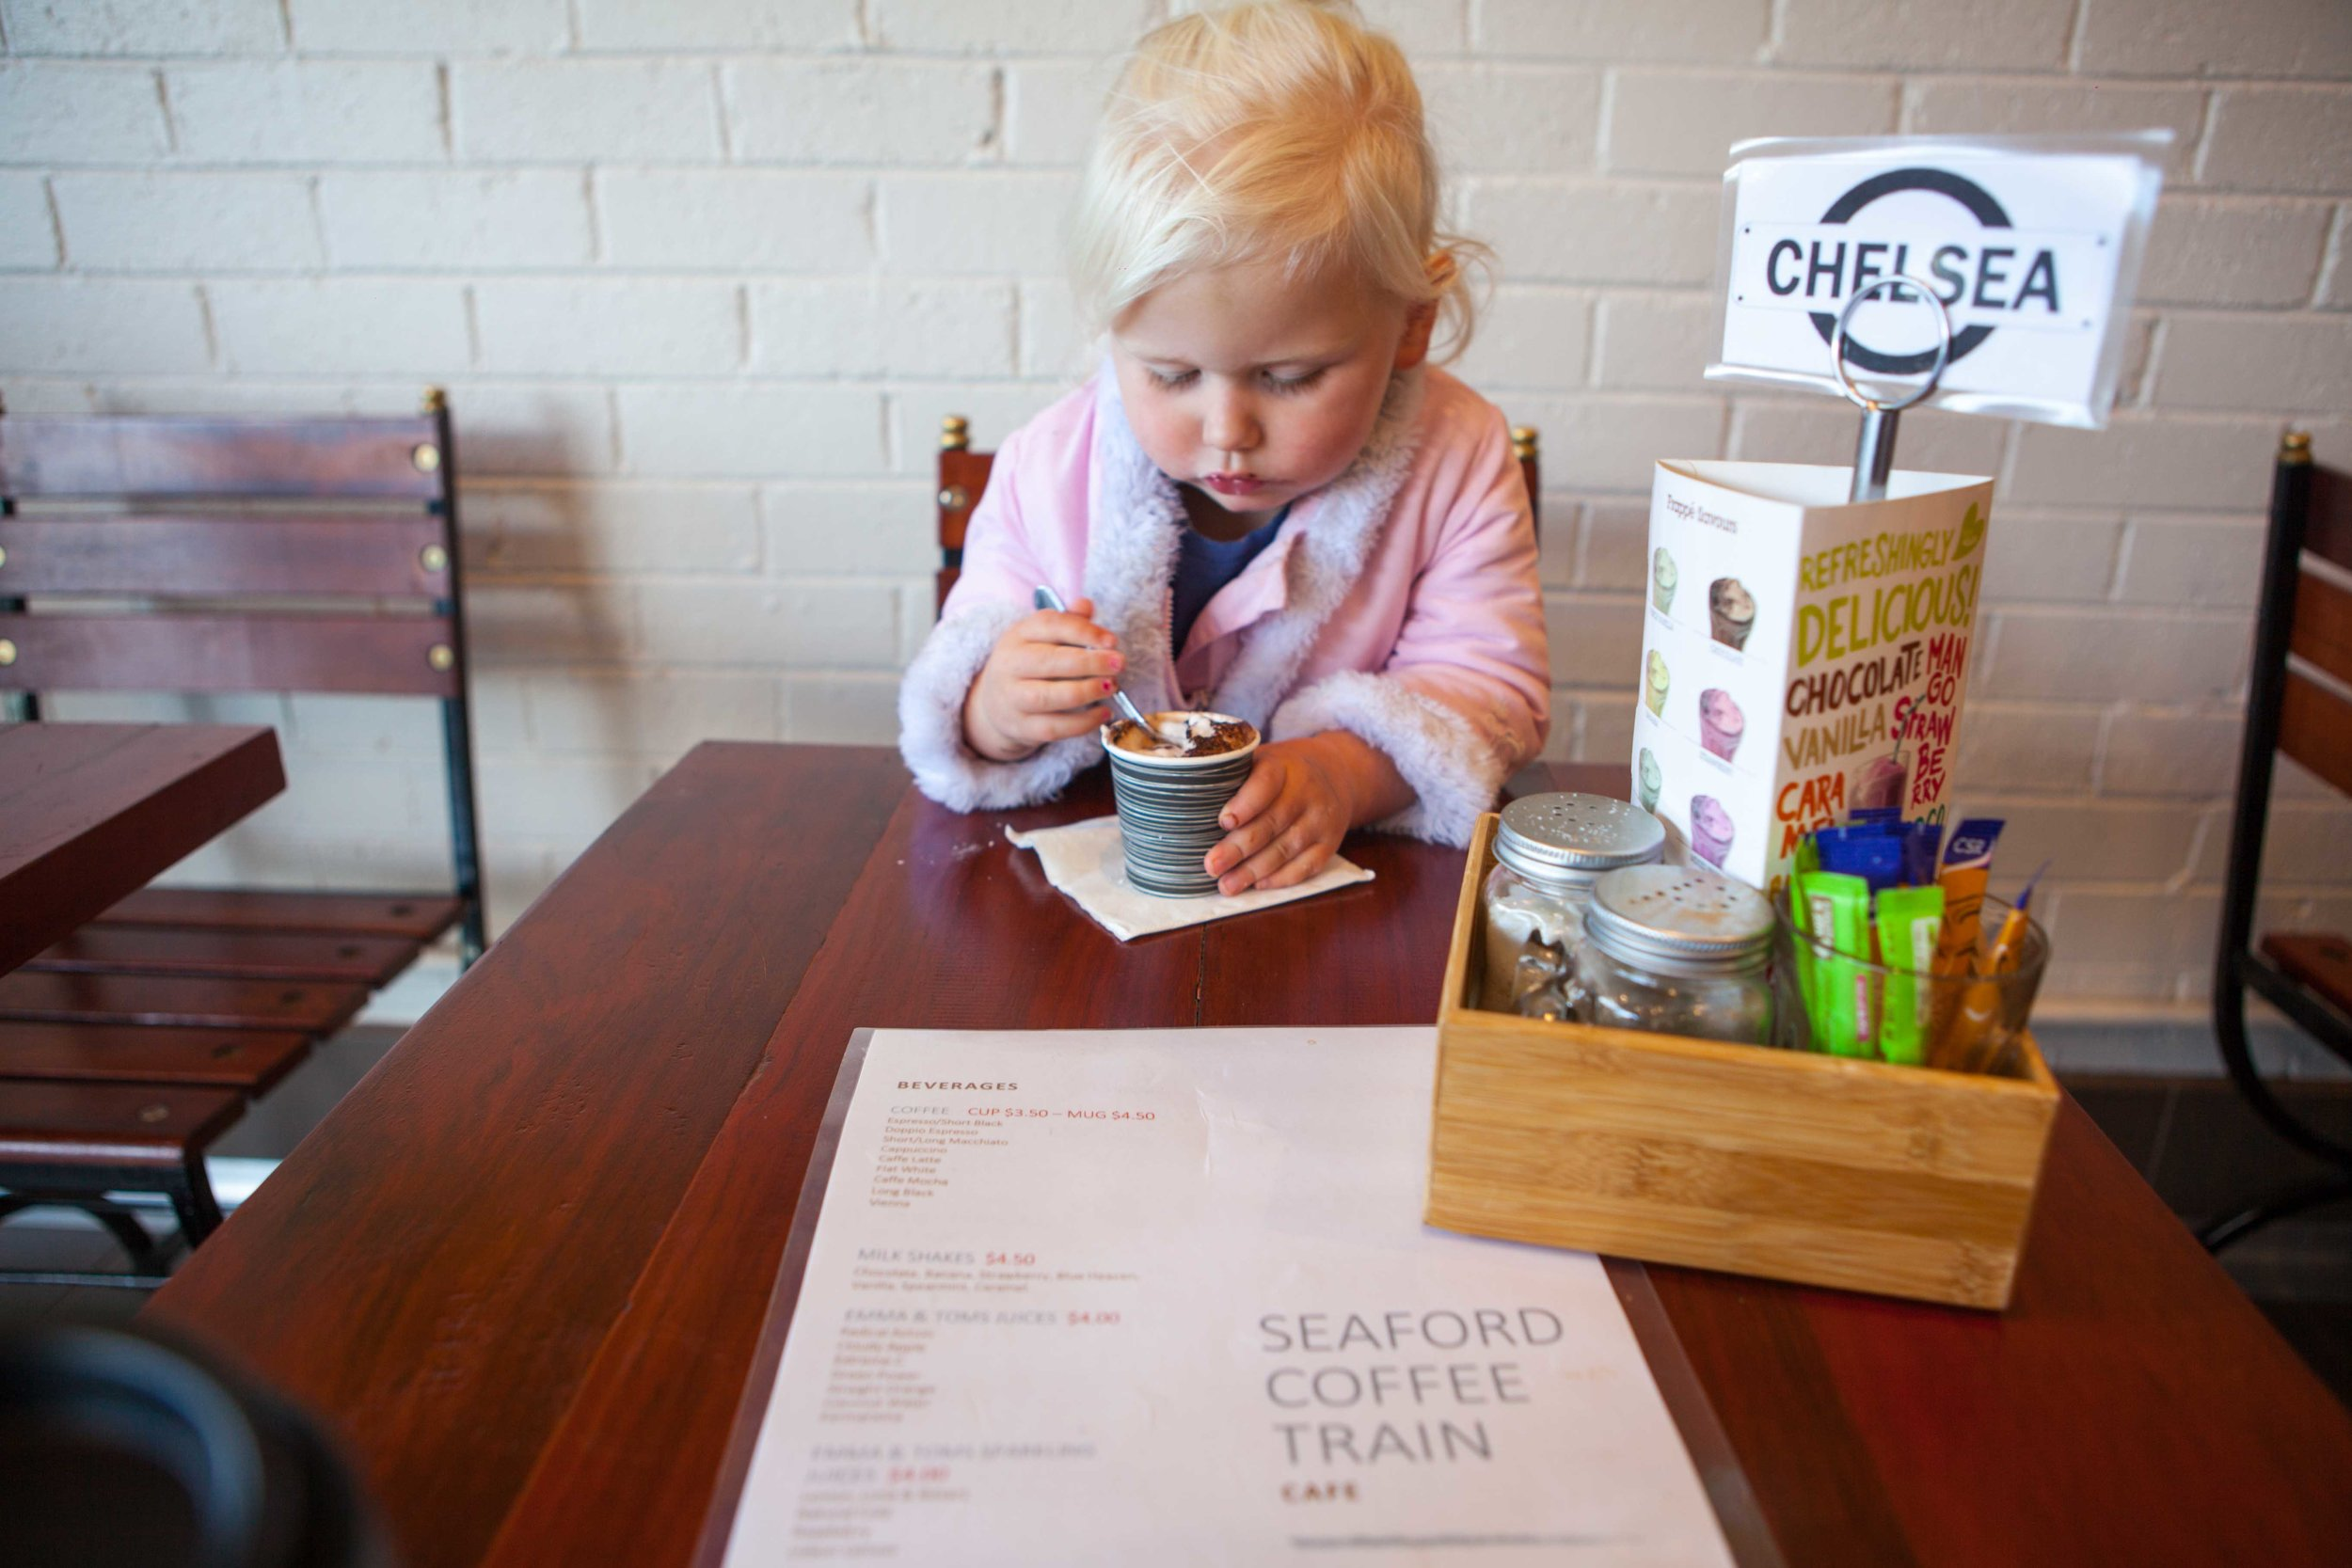 mamma knows south - coffee train seaford